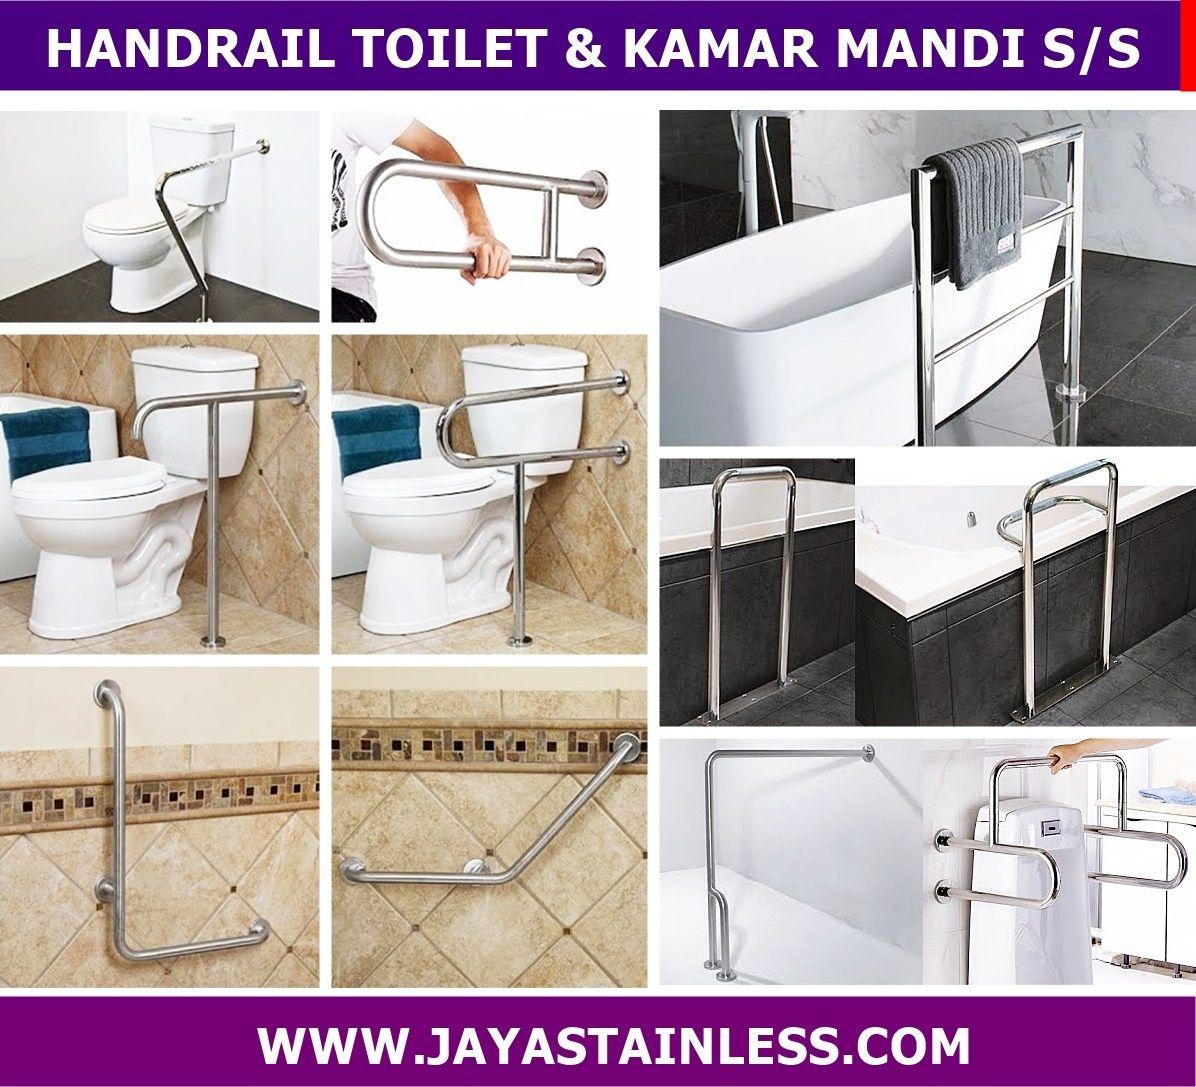 Katalog Handrail kamar mandi - pegangan toilet